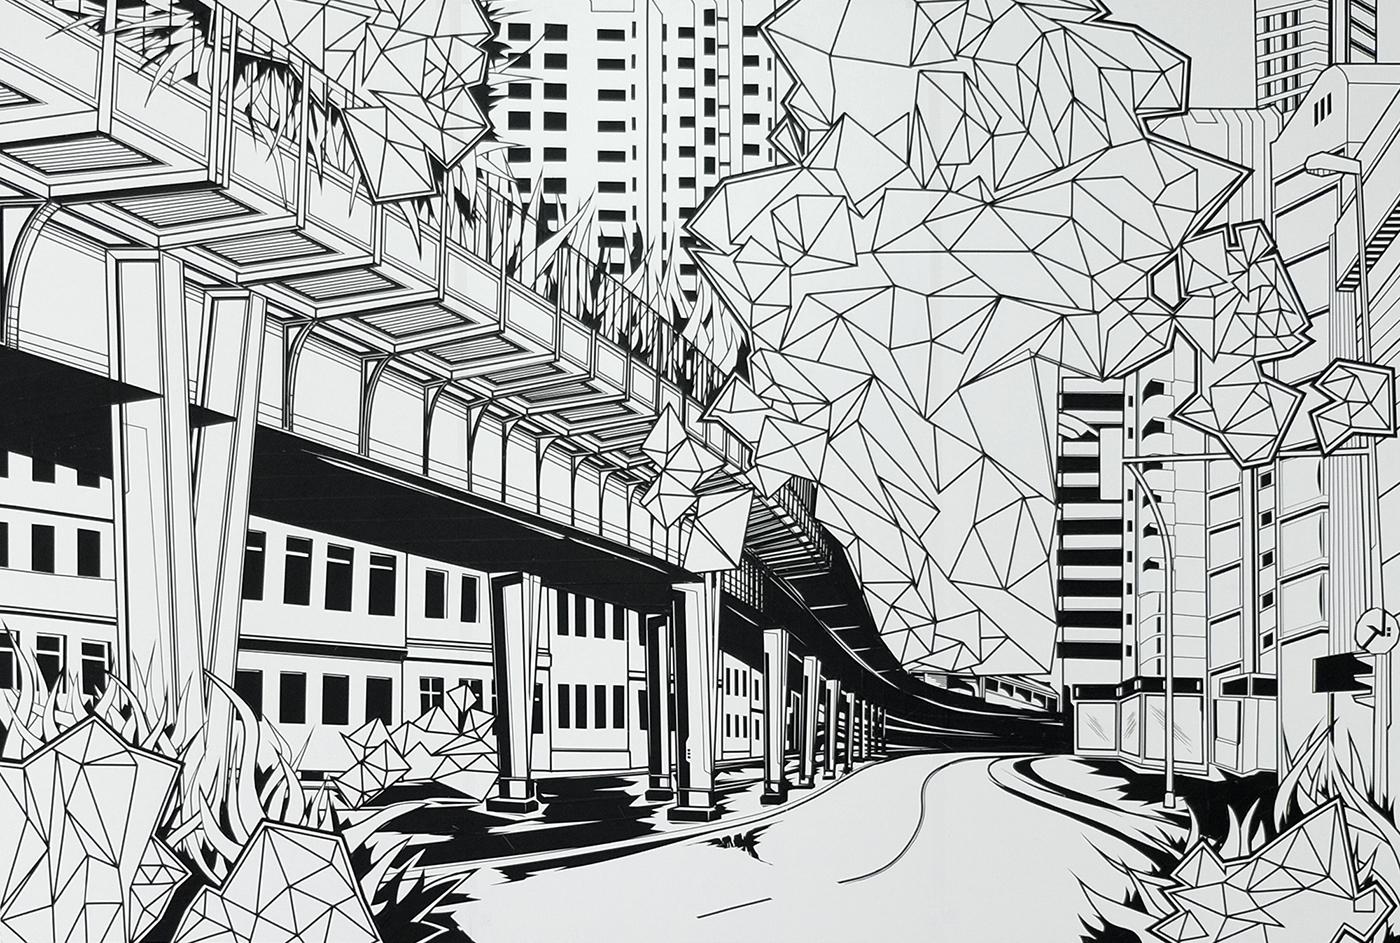 klebebande Tapeart Urbanart streetart art klebekunst Exhibition